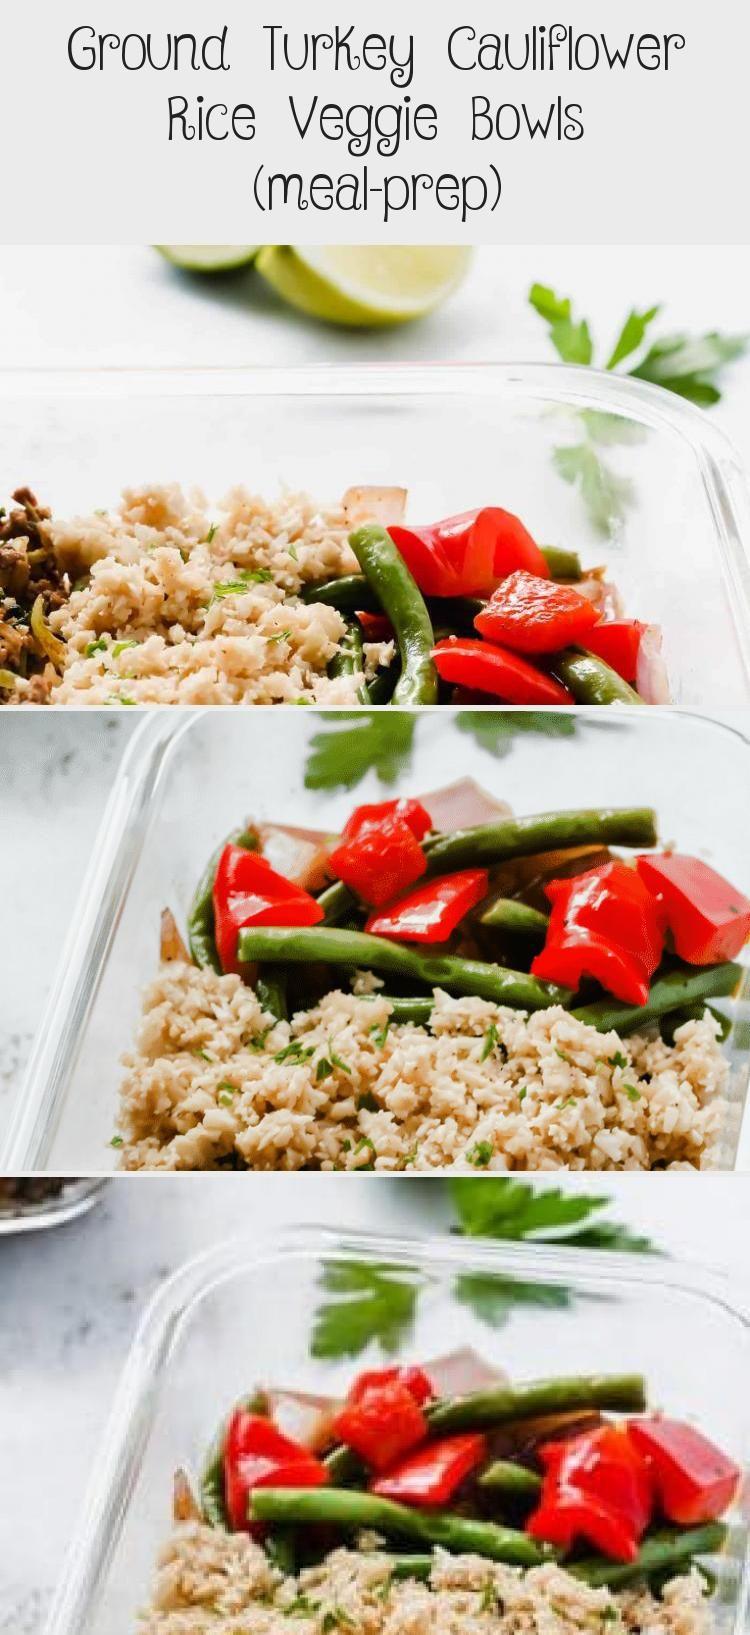 Photo of Ground Turkey Cauliflower Rice Veggie Bowls (meal-prep) – Healthy Recipes